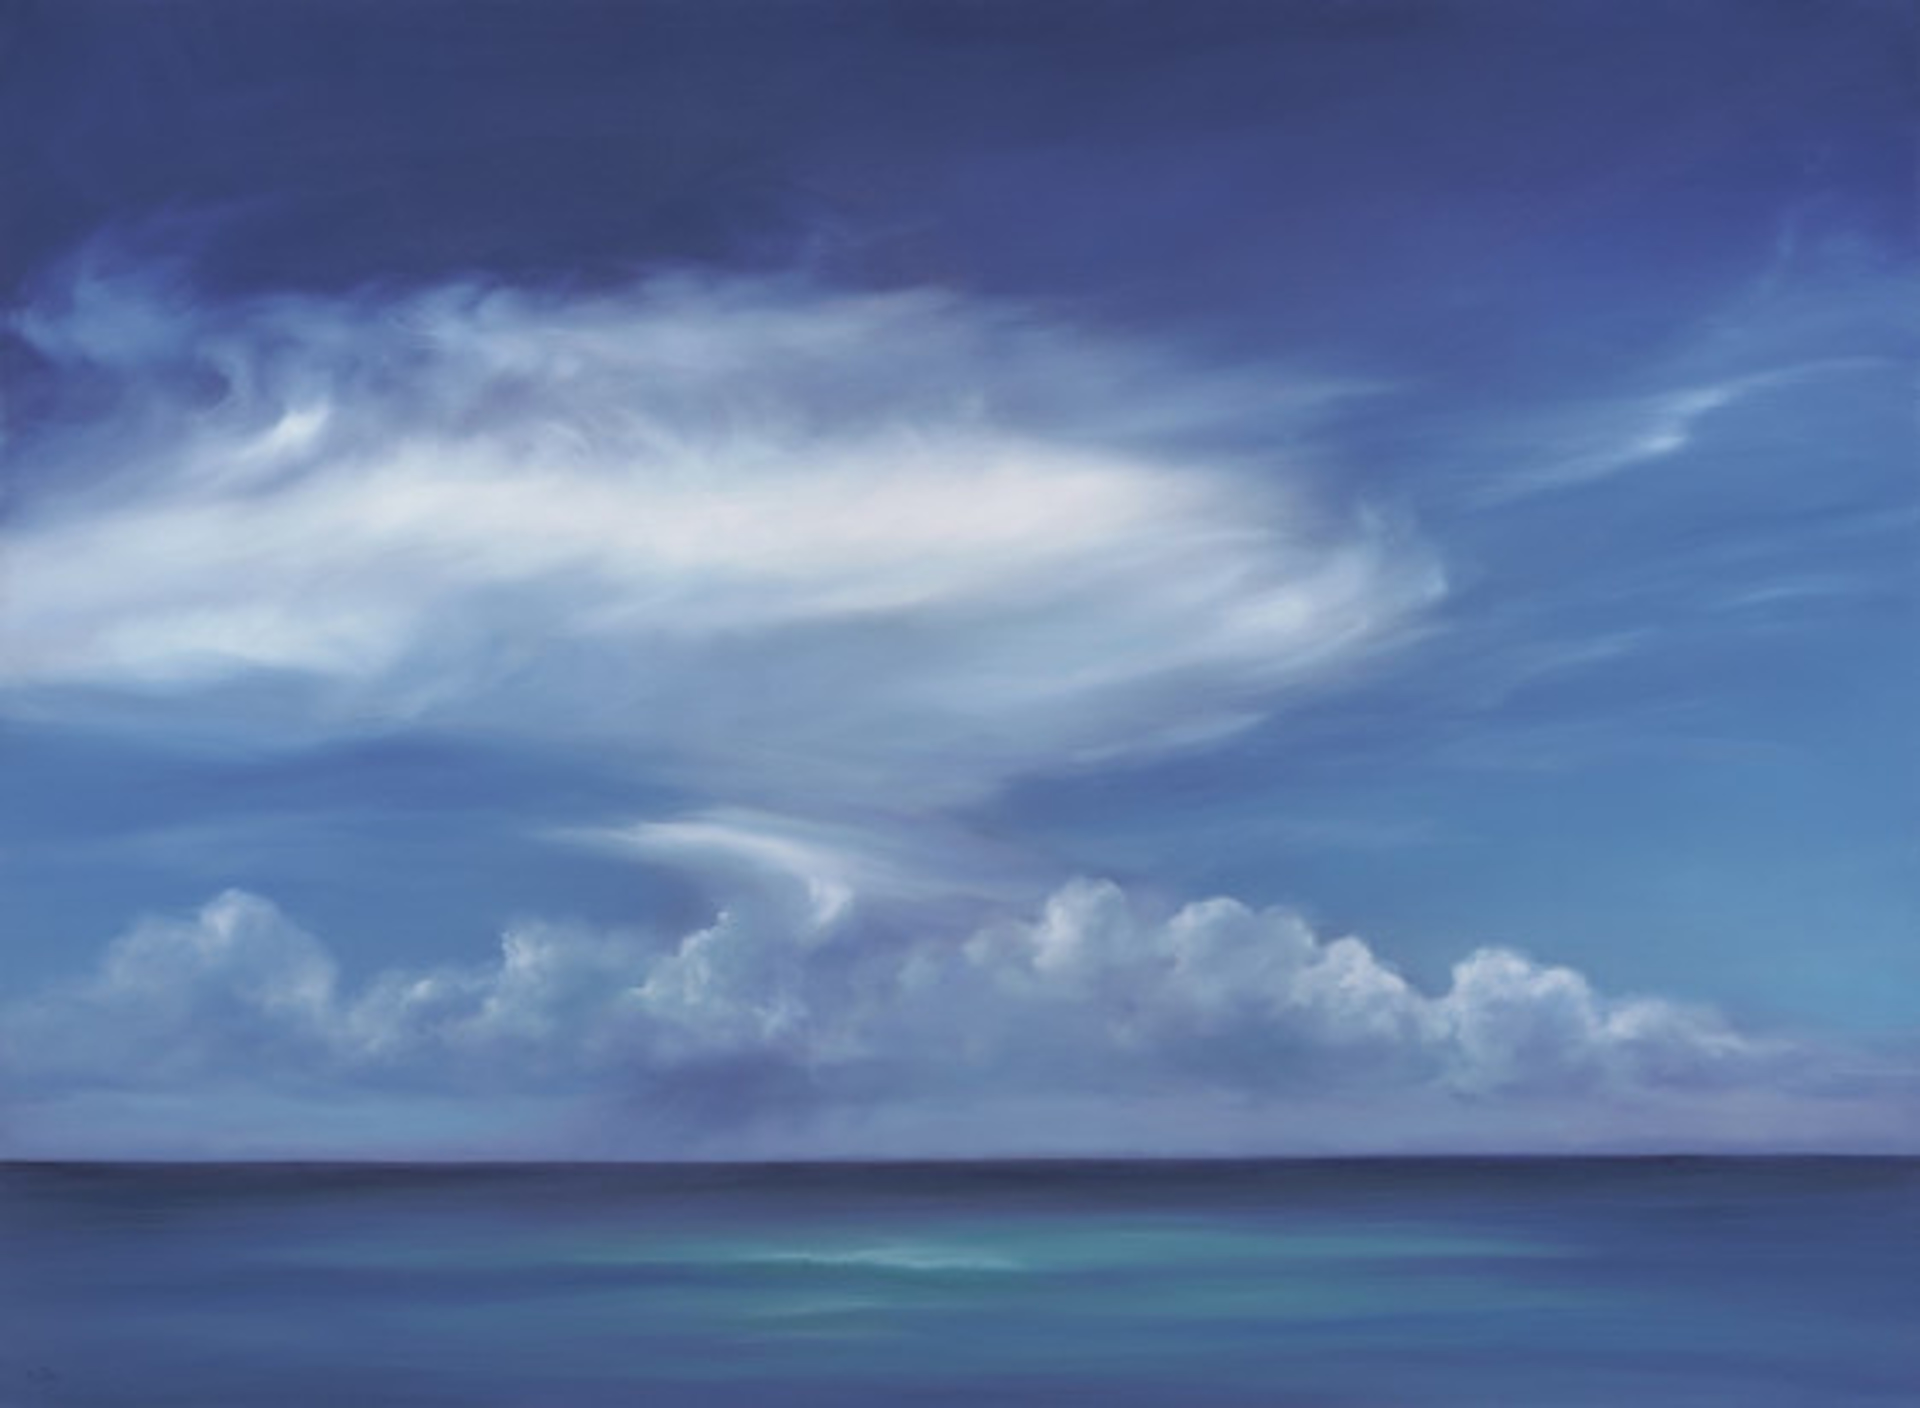 Blue Paradise #3 by Cheryl Kline